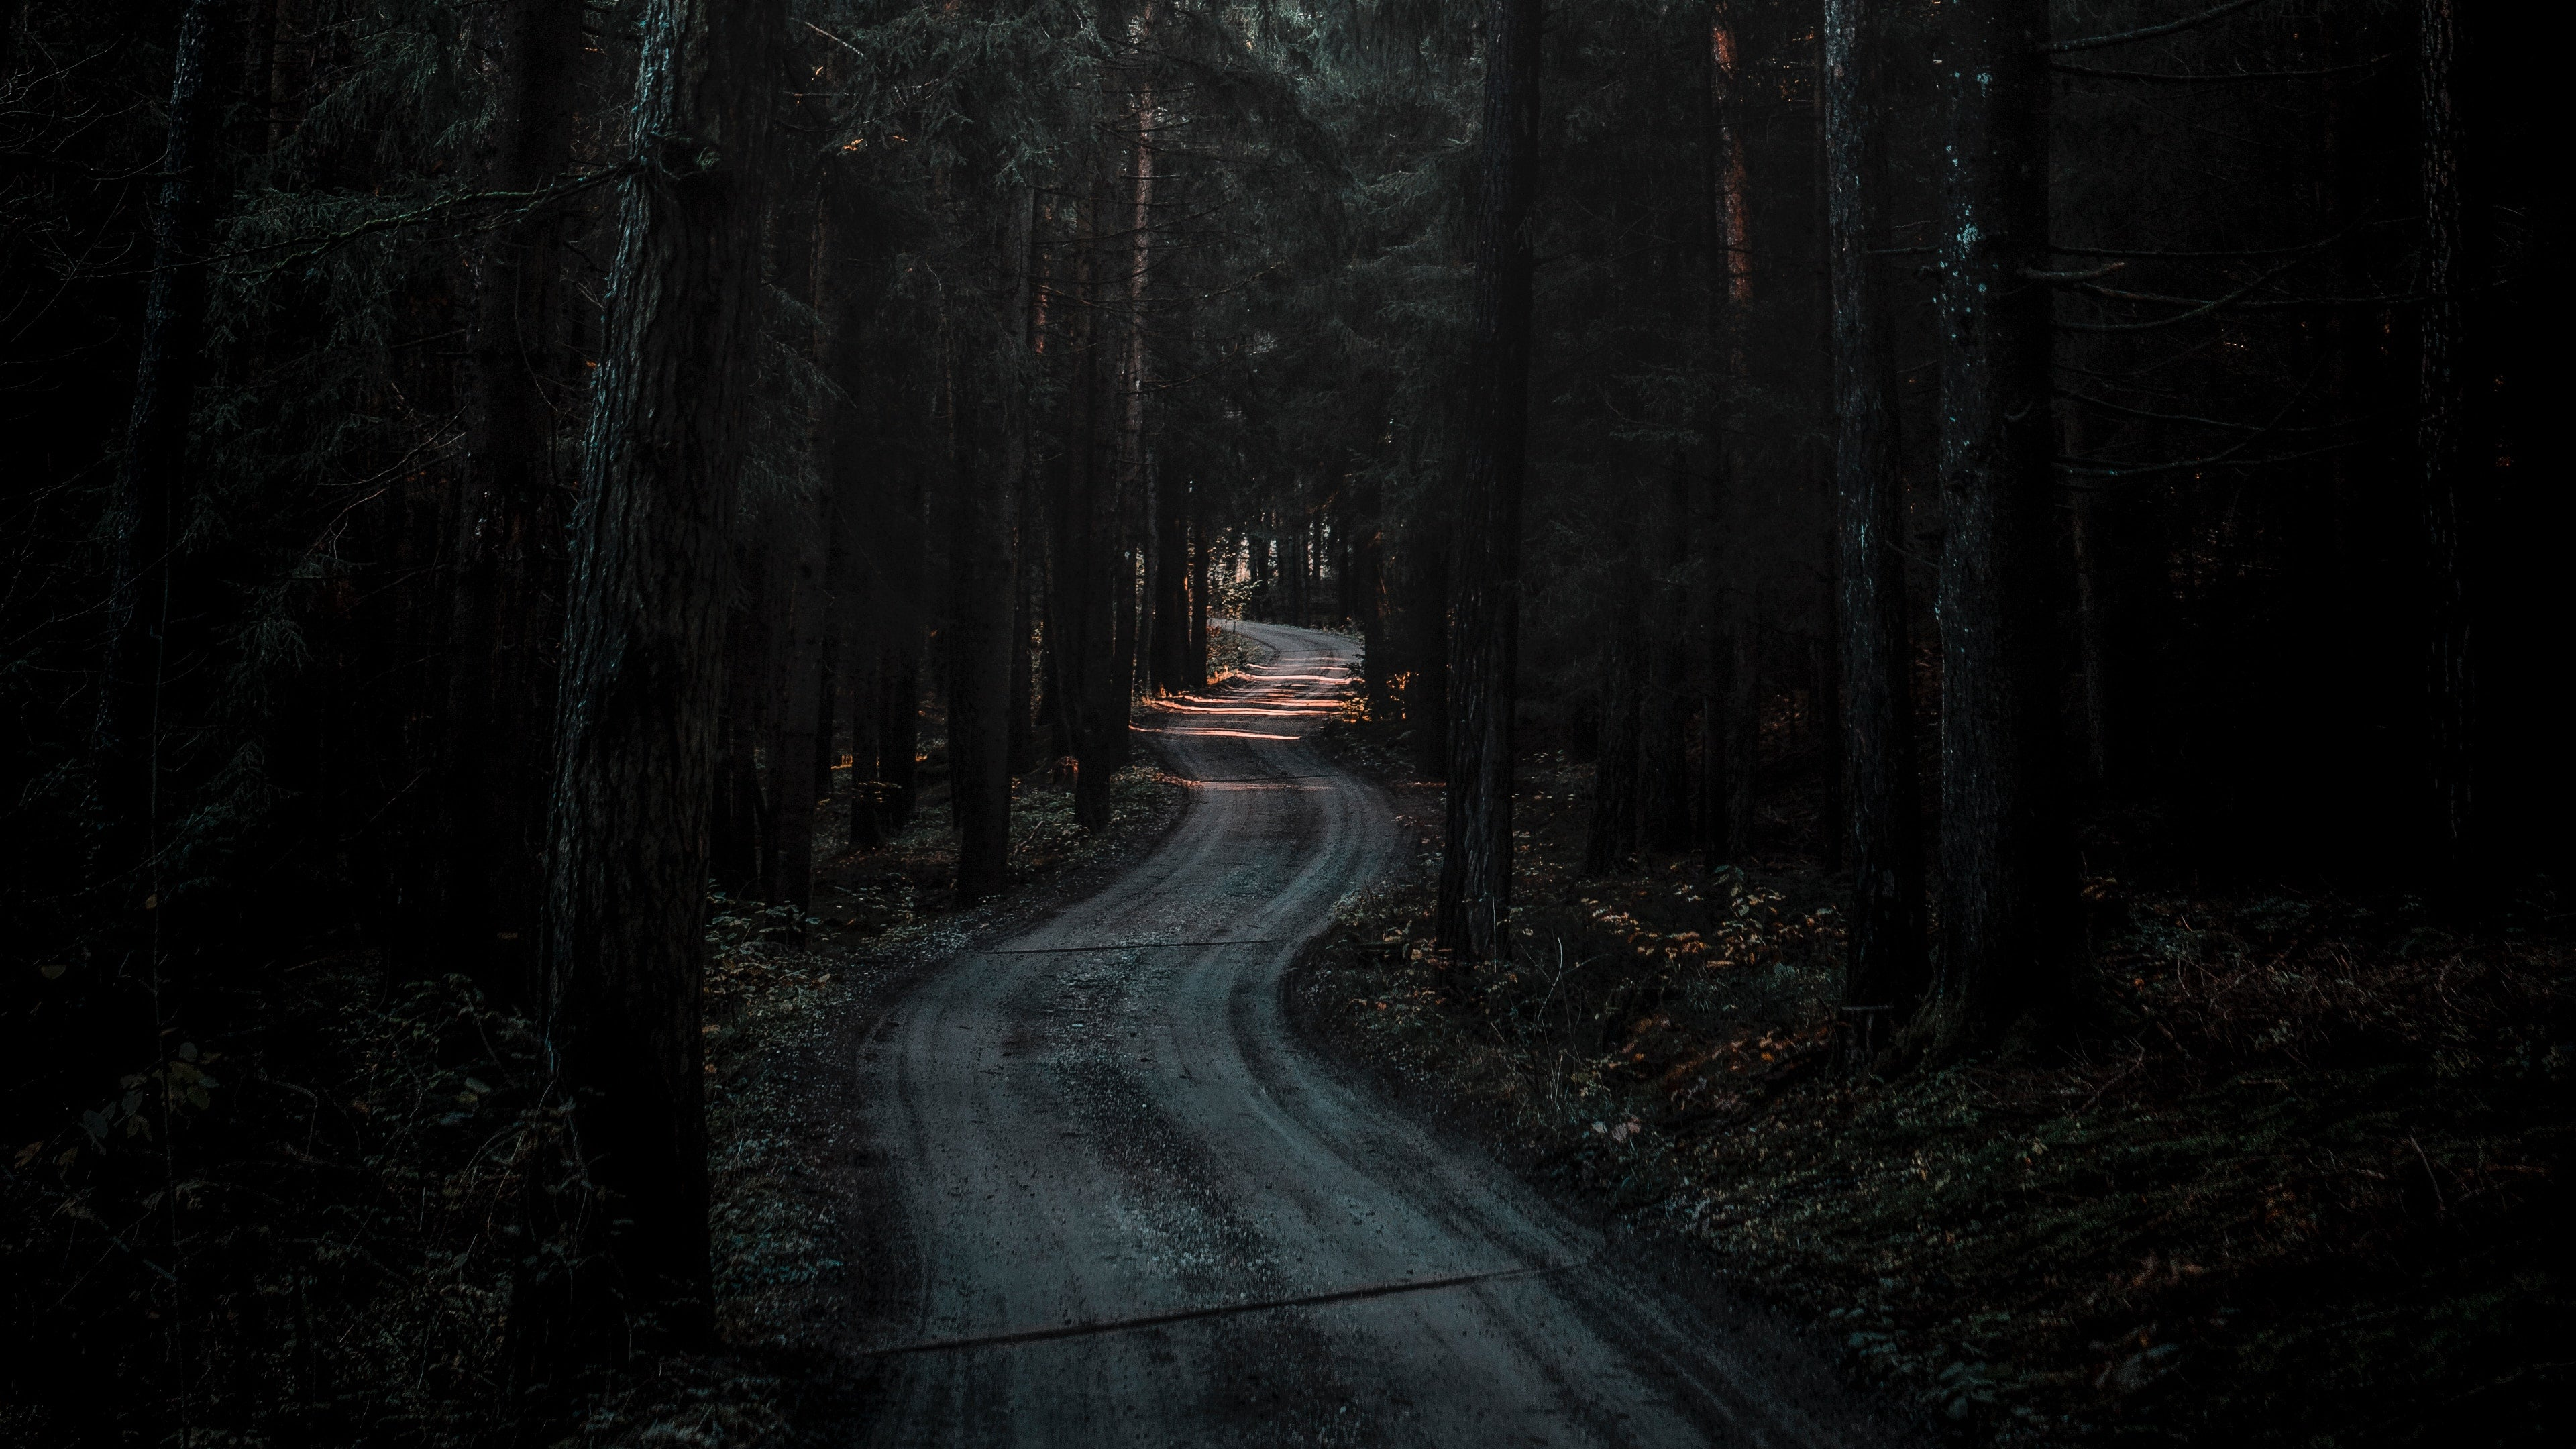 Hình nền tối tăm